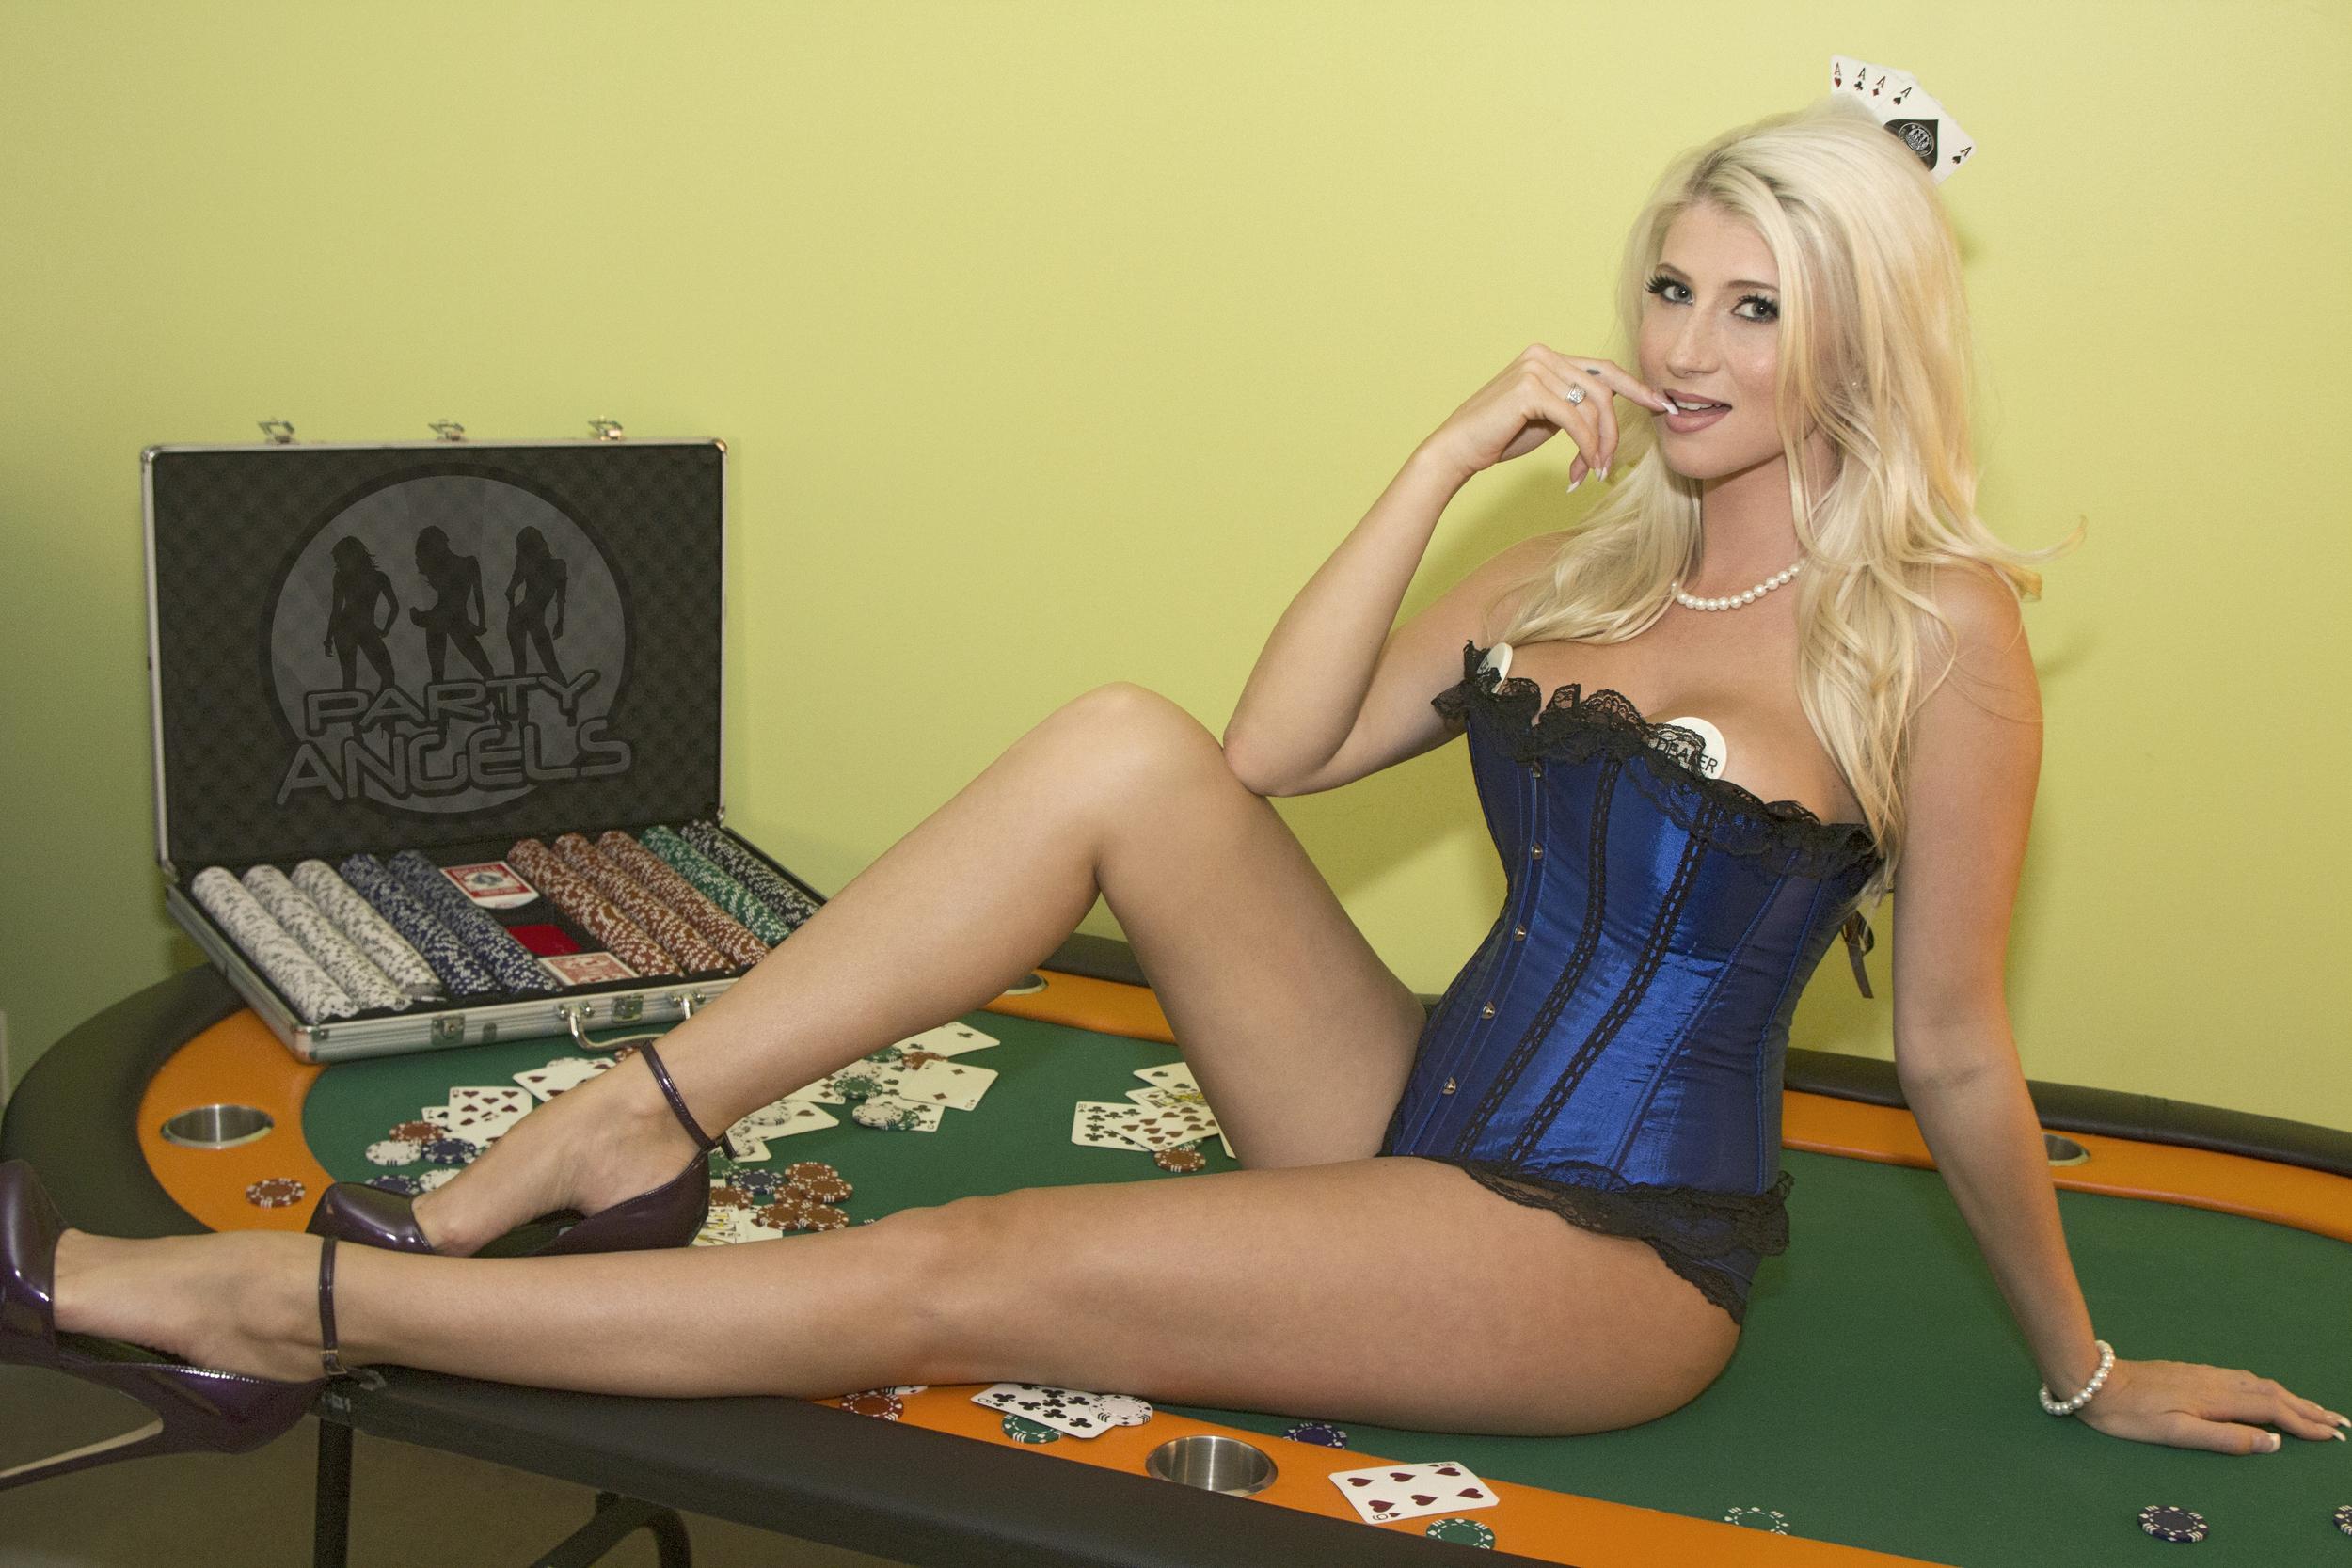 gorgeous_pokergirl.jpg